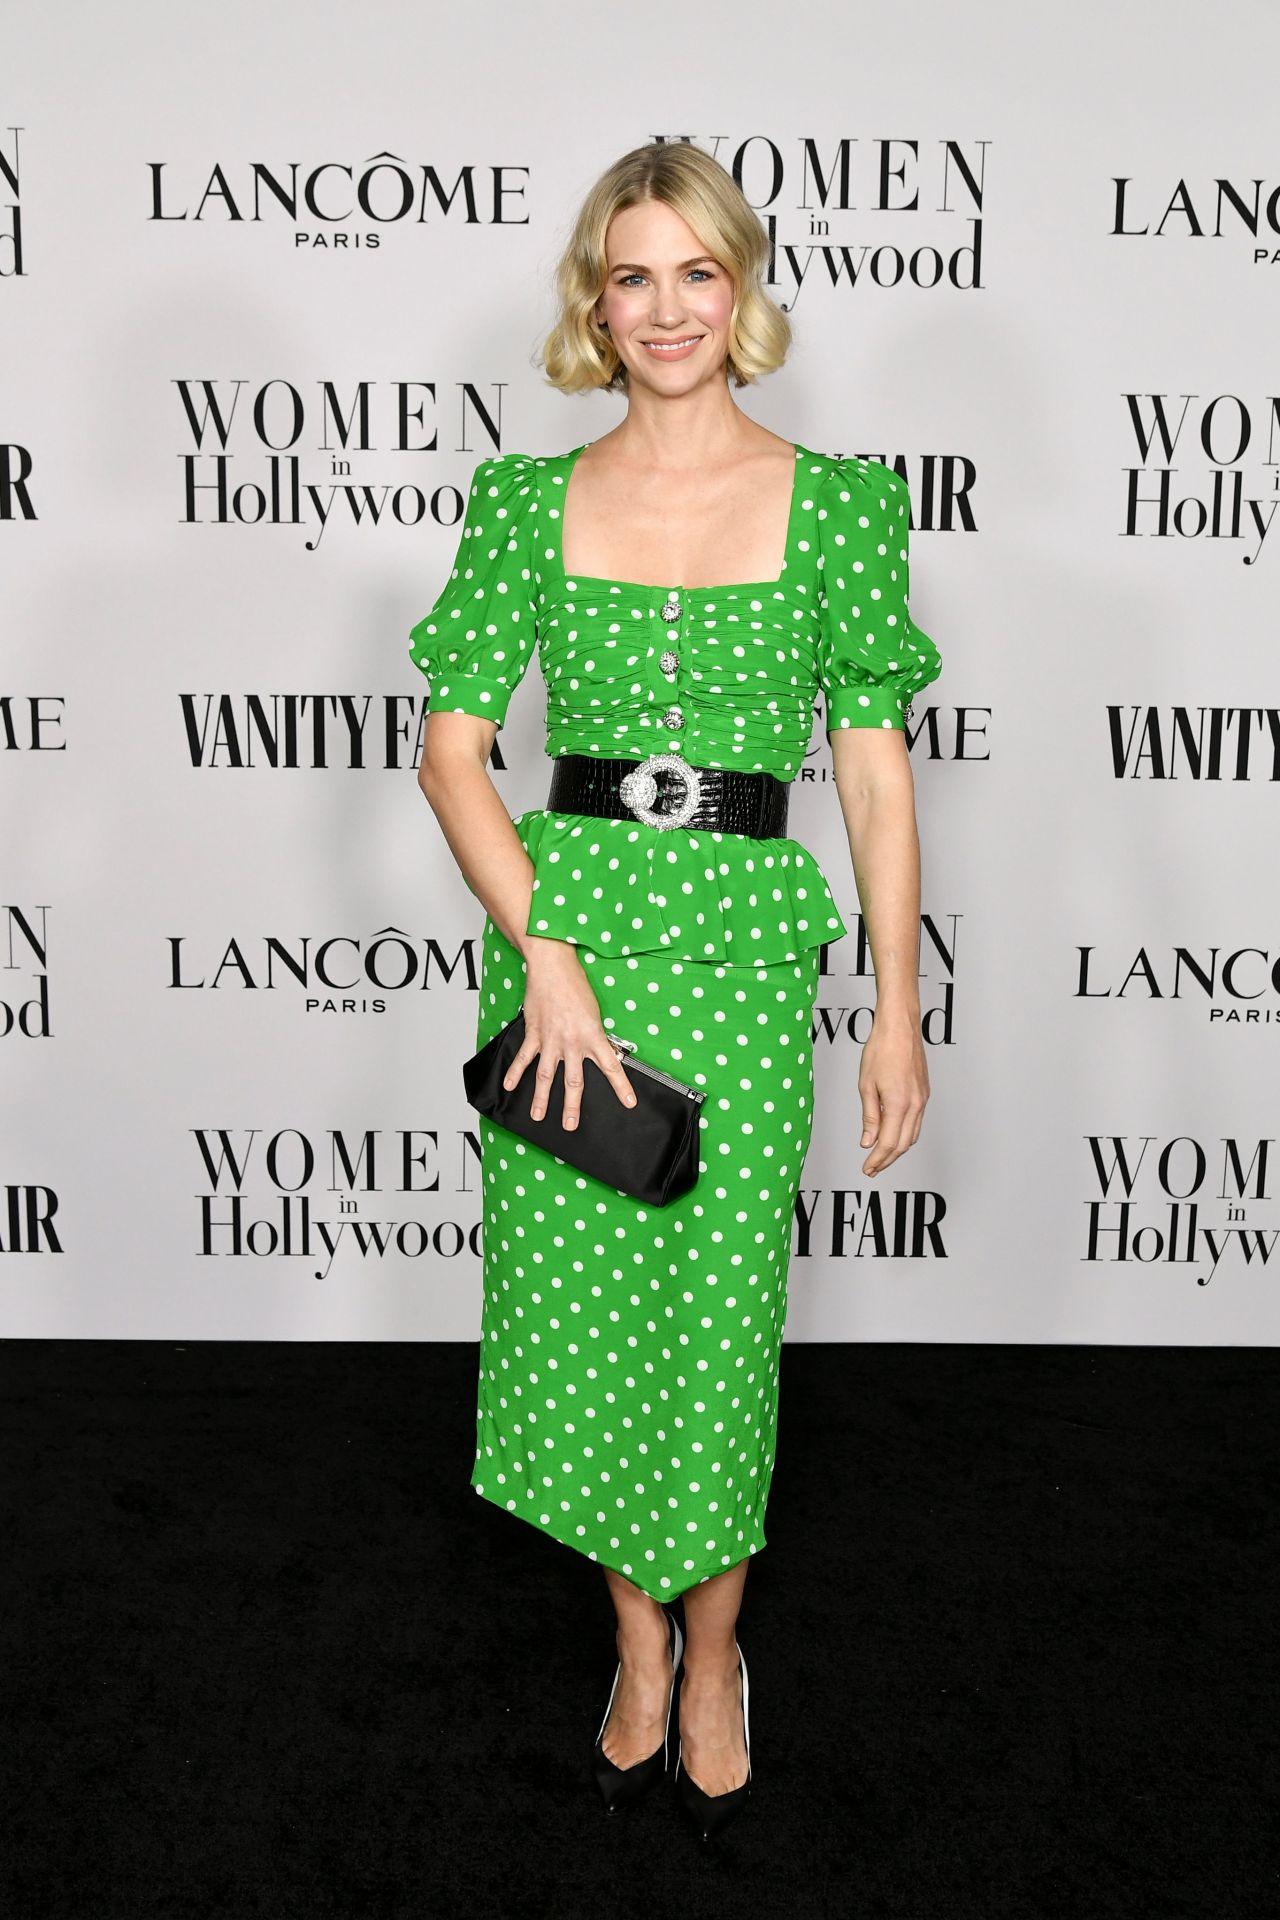 LANCOME SPON - Kathleen Maloney - US - Vanity Fair - Campaign Hollywood - Sponsor 2